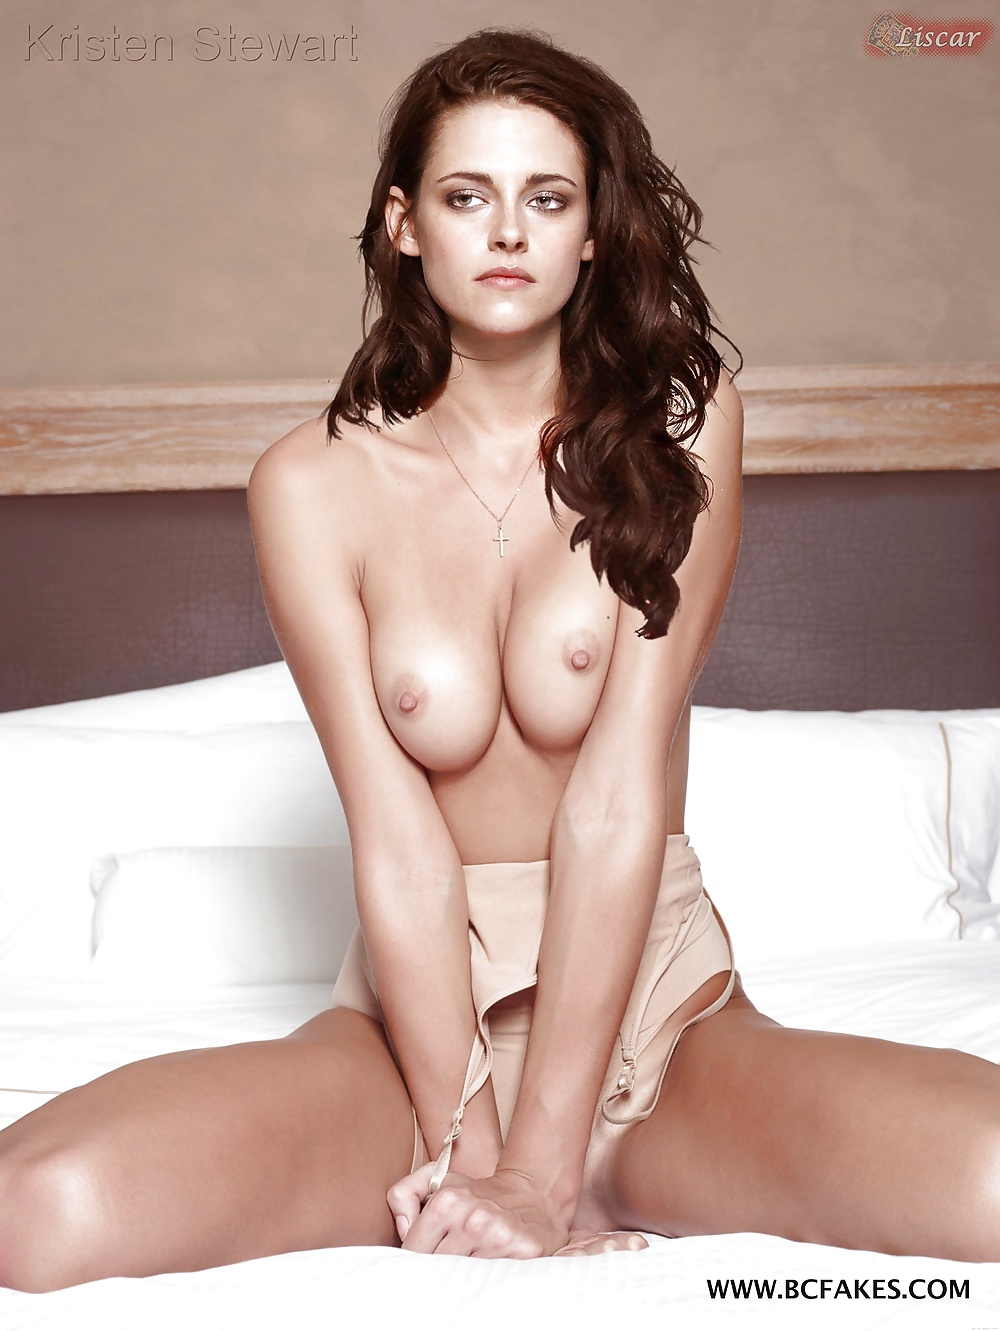 Twilight fake nudes, hot fuck nd kiss